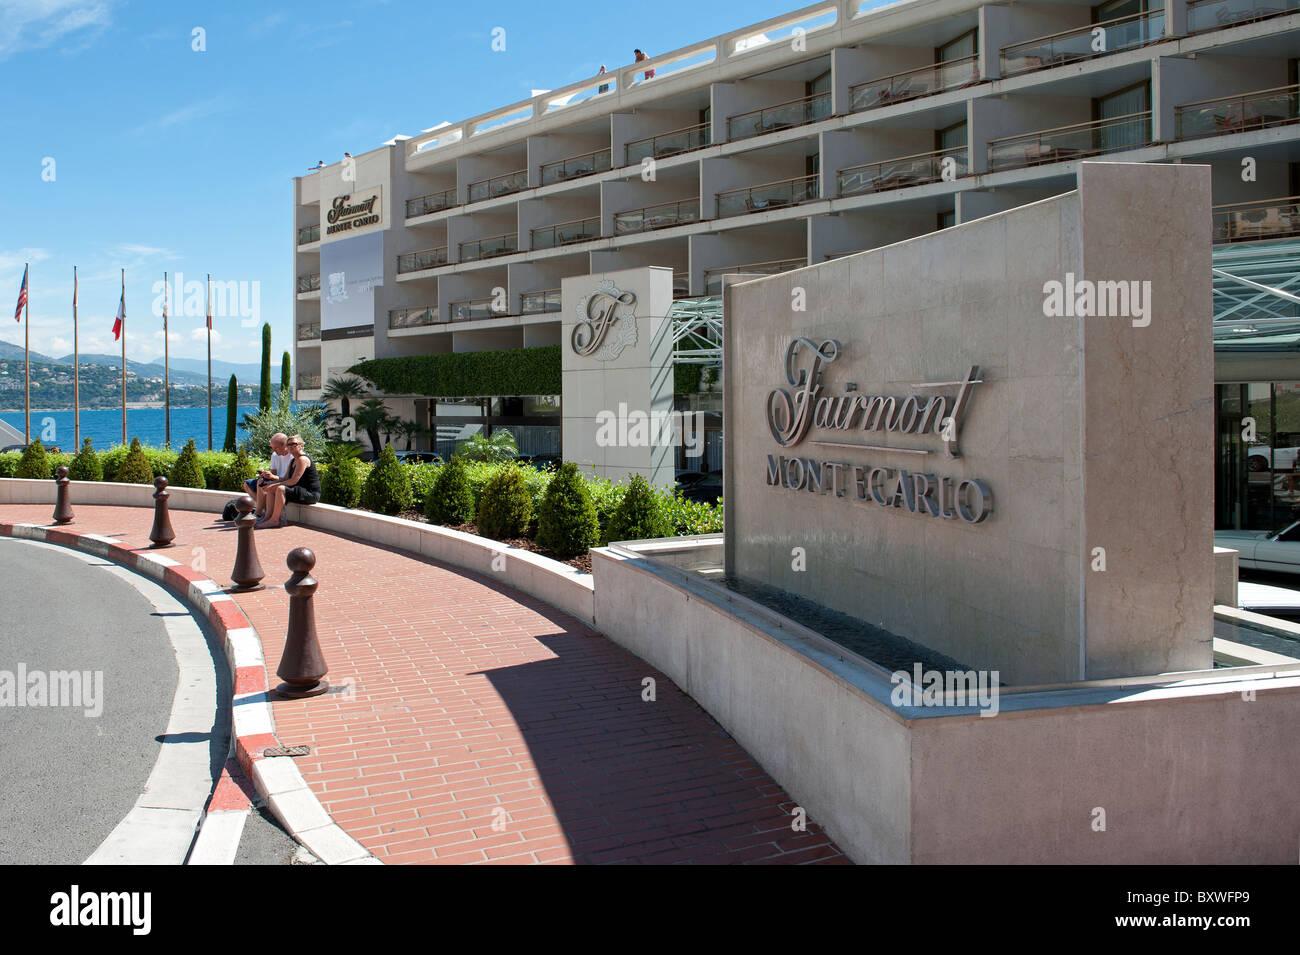 Das Fairmont Hotel Monte Carlo Monaco Stockfoto Bild 33752609 Alamy